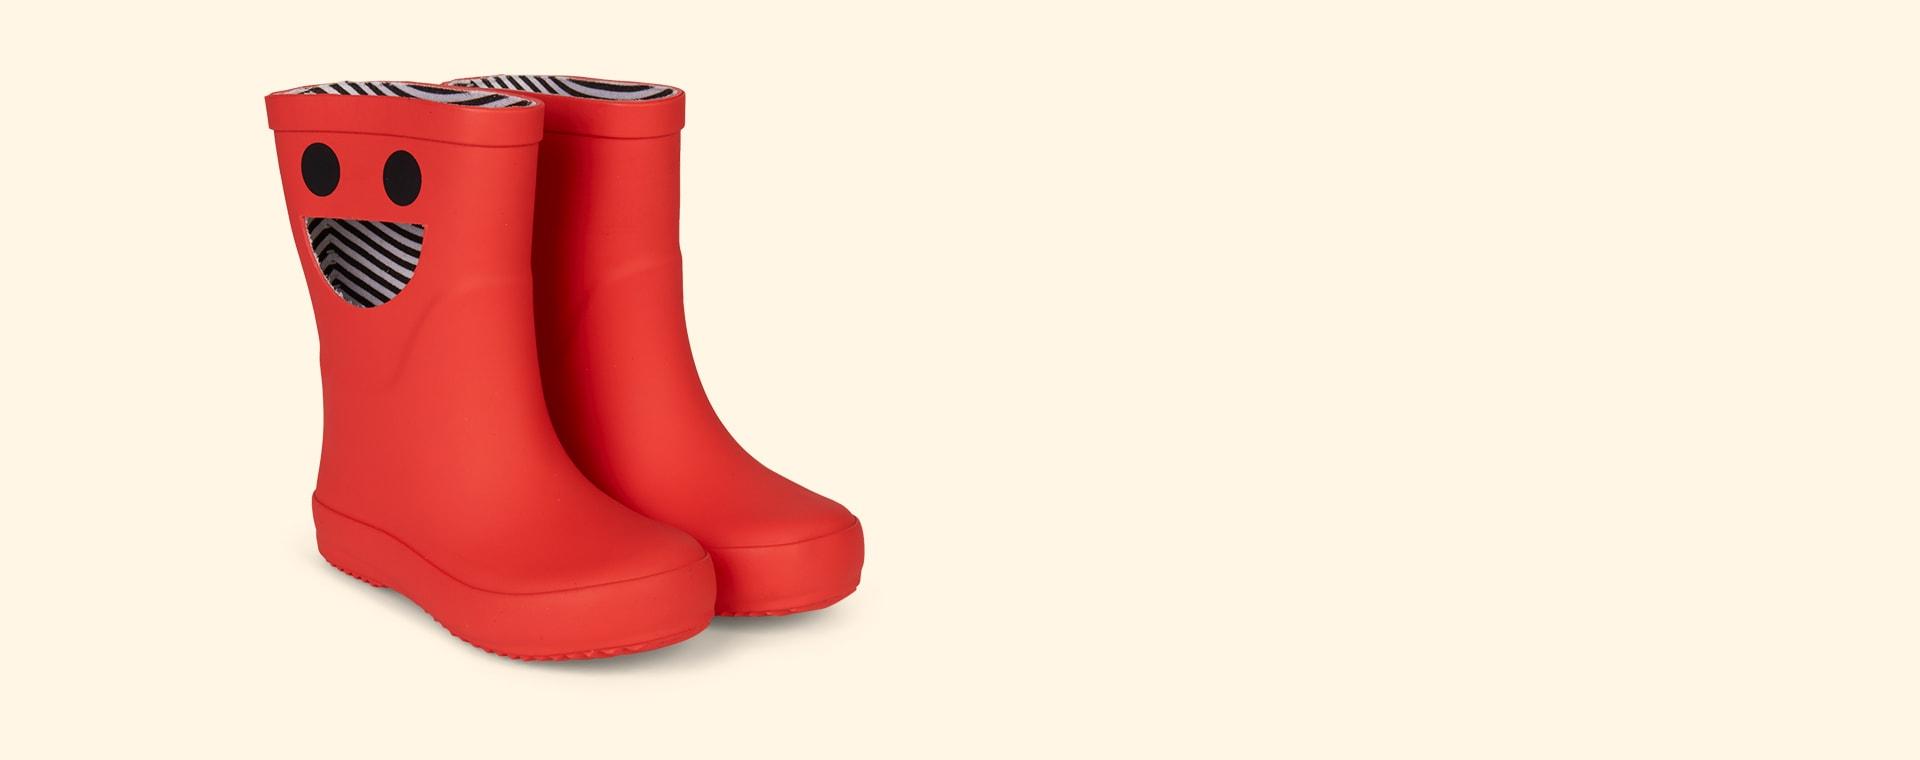 Red Boxbo Wistiti High Welly Boot